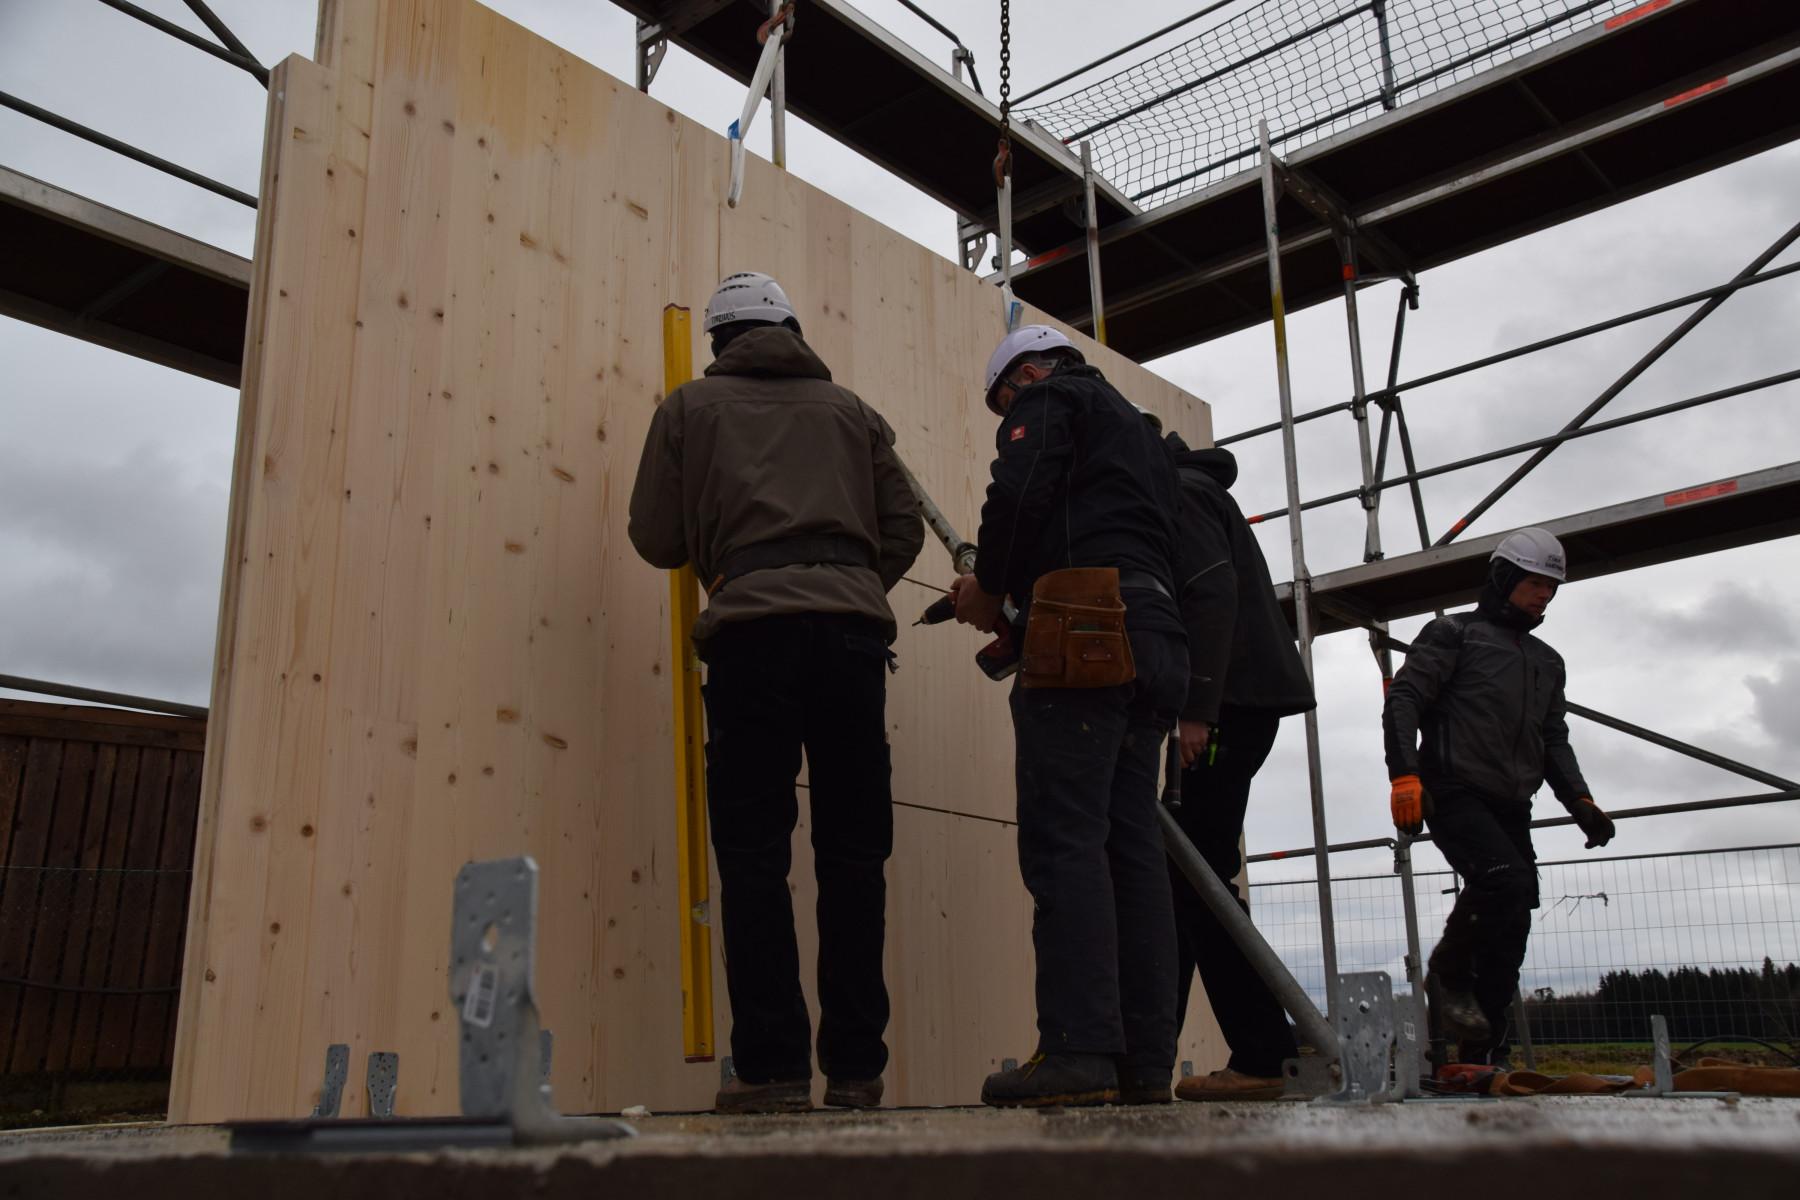 DSC_0306Strasser Holzbau Riedering.jpg